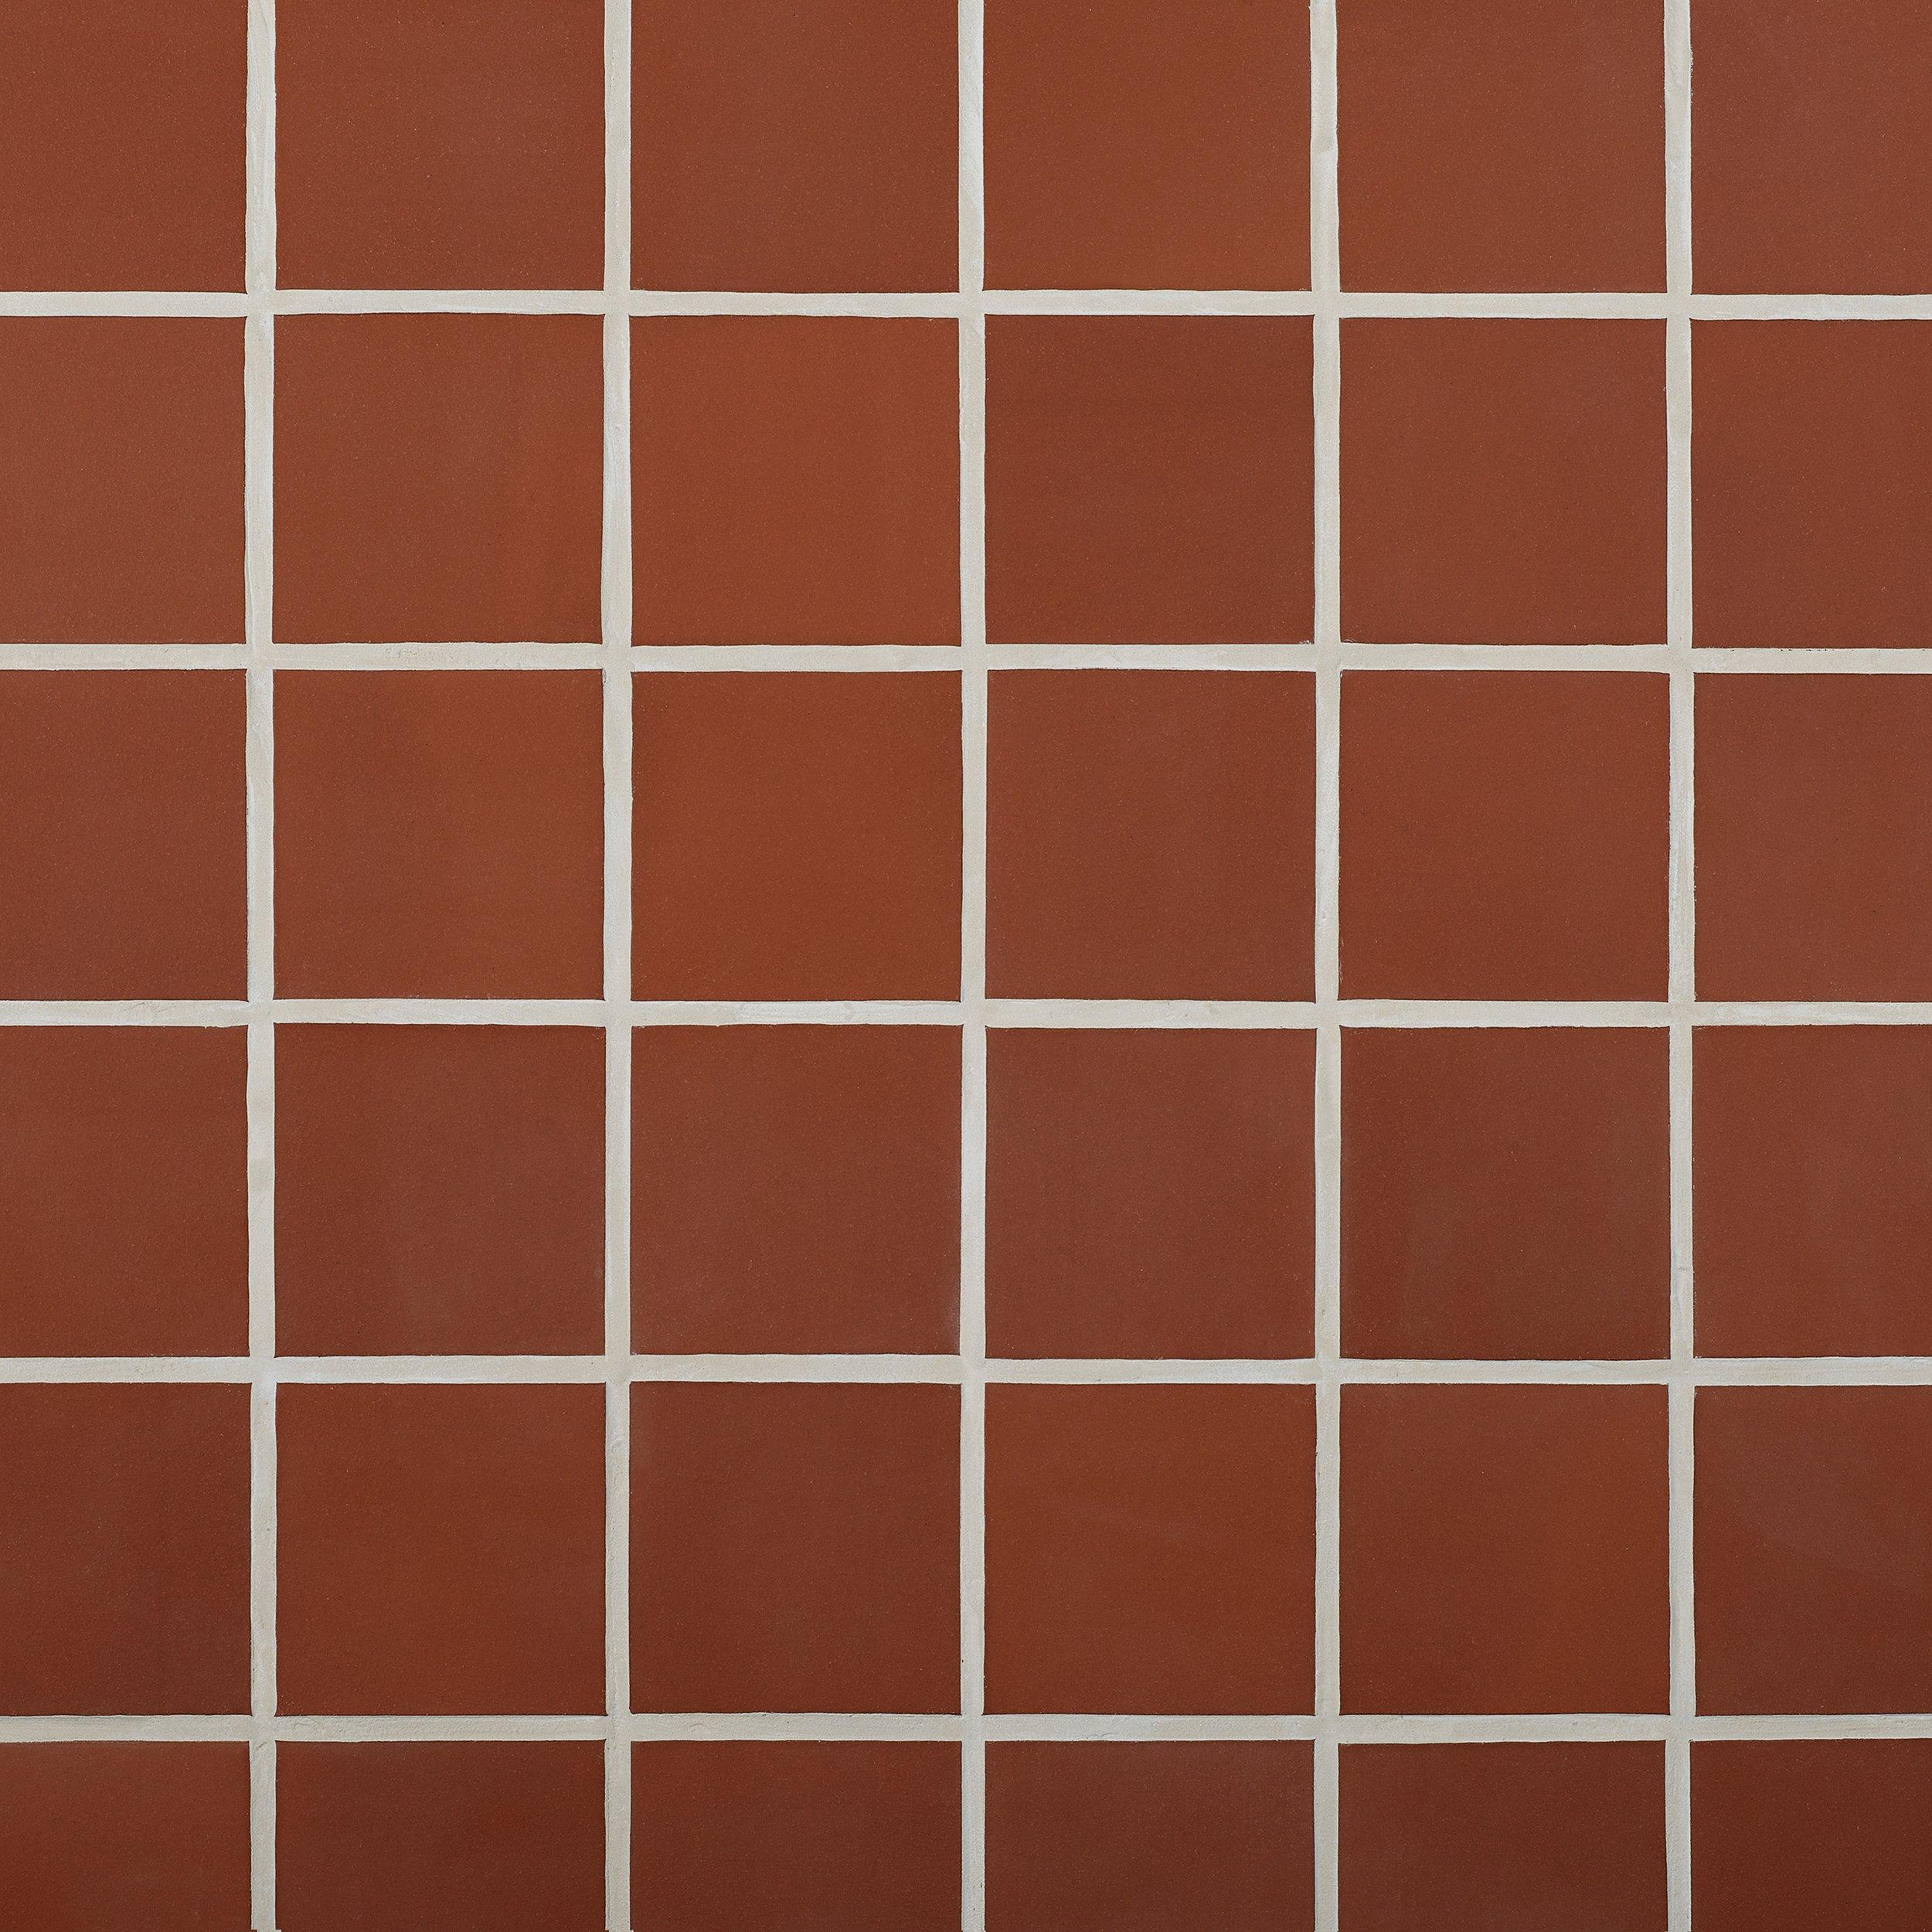 montebello gray cove base quarry tile